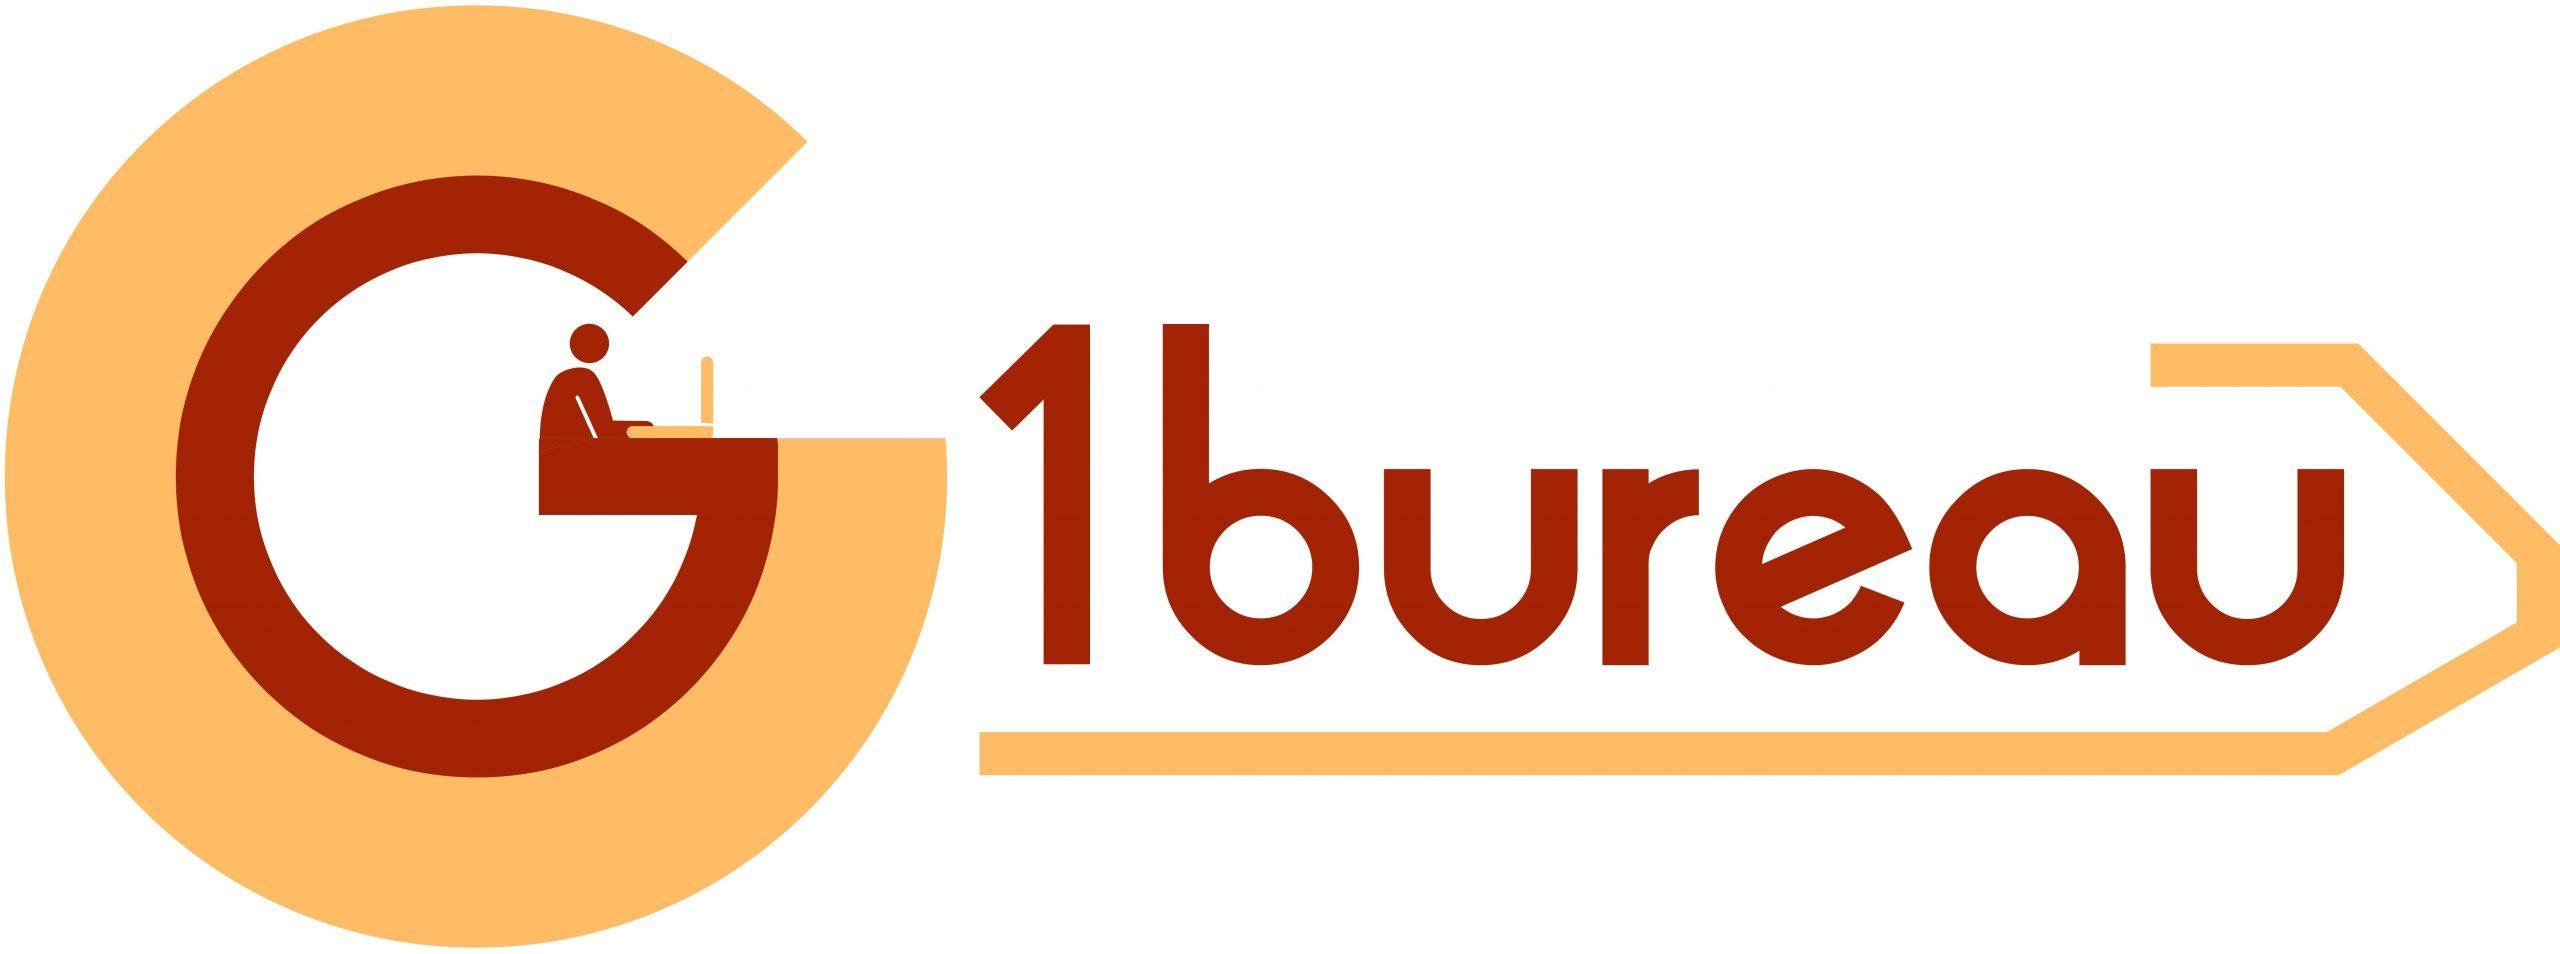 G1Bureau